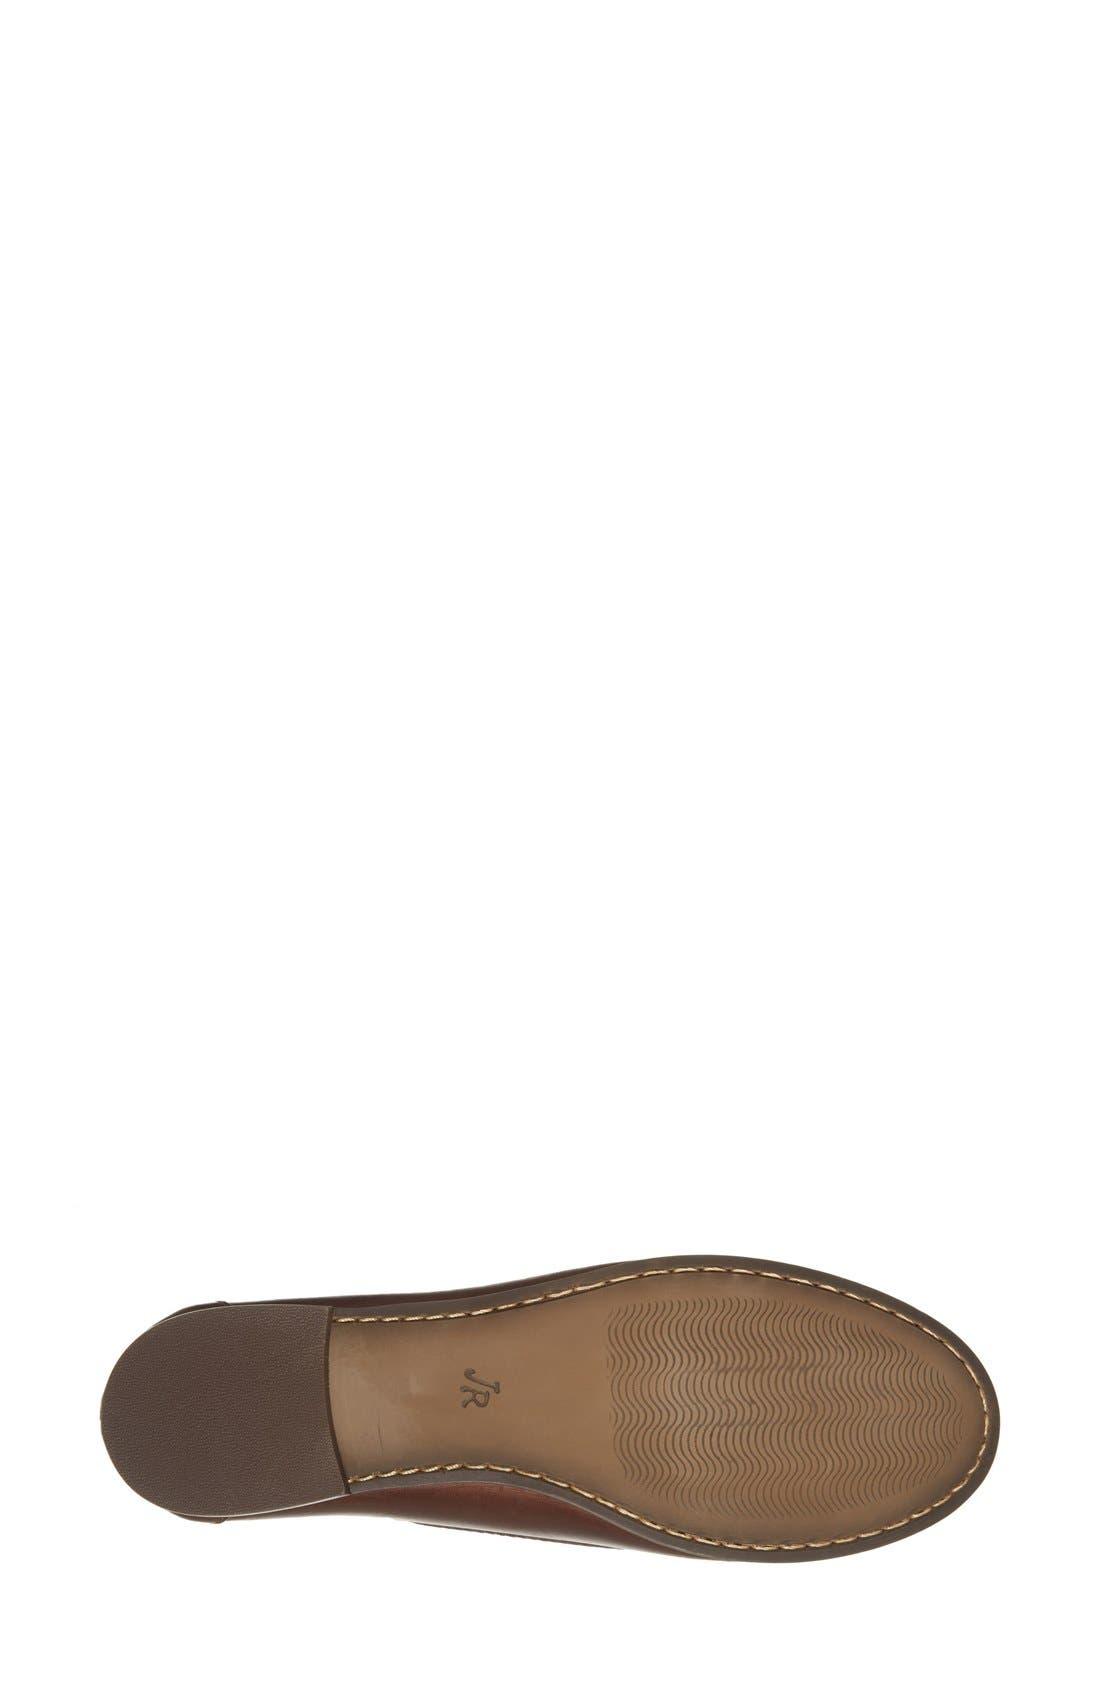 'Quinn' Leather Loafer,                             Alternate thumbnail 21, color,